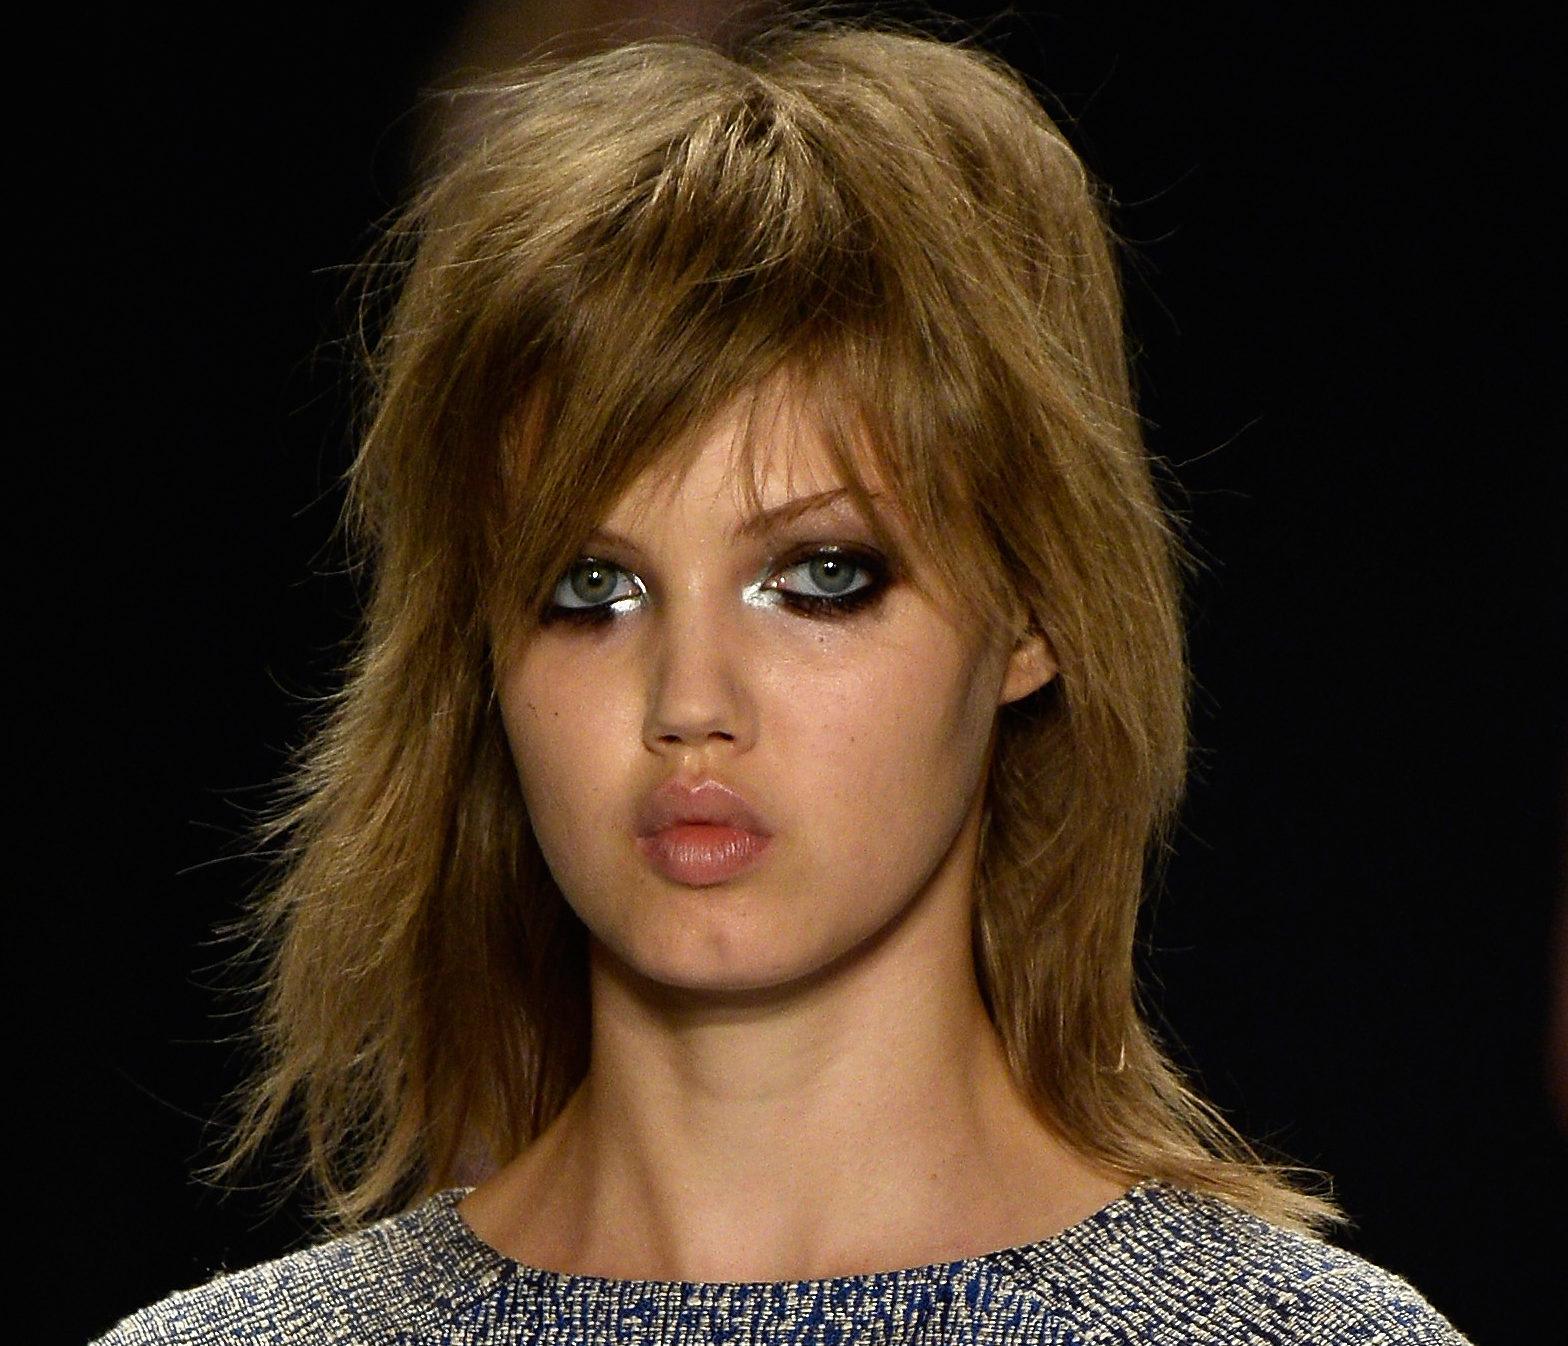 Die 5 Neusten Haartrends Von Kopf Bis Fuss